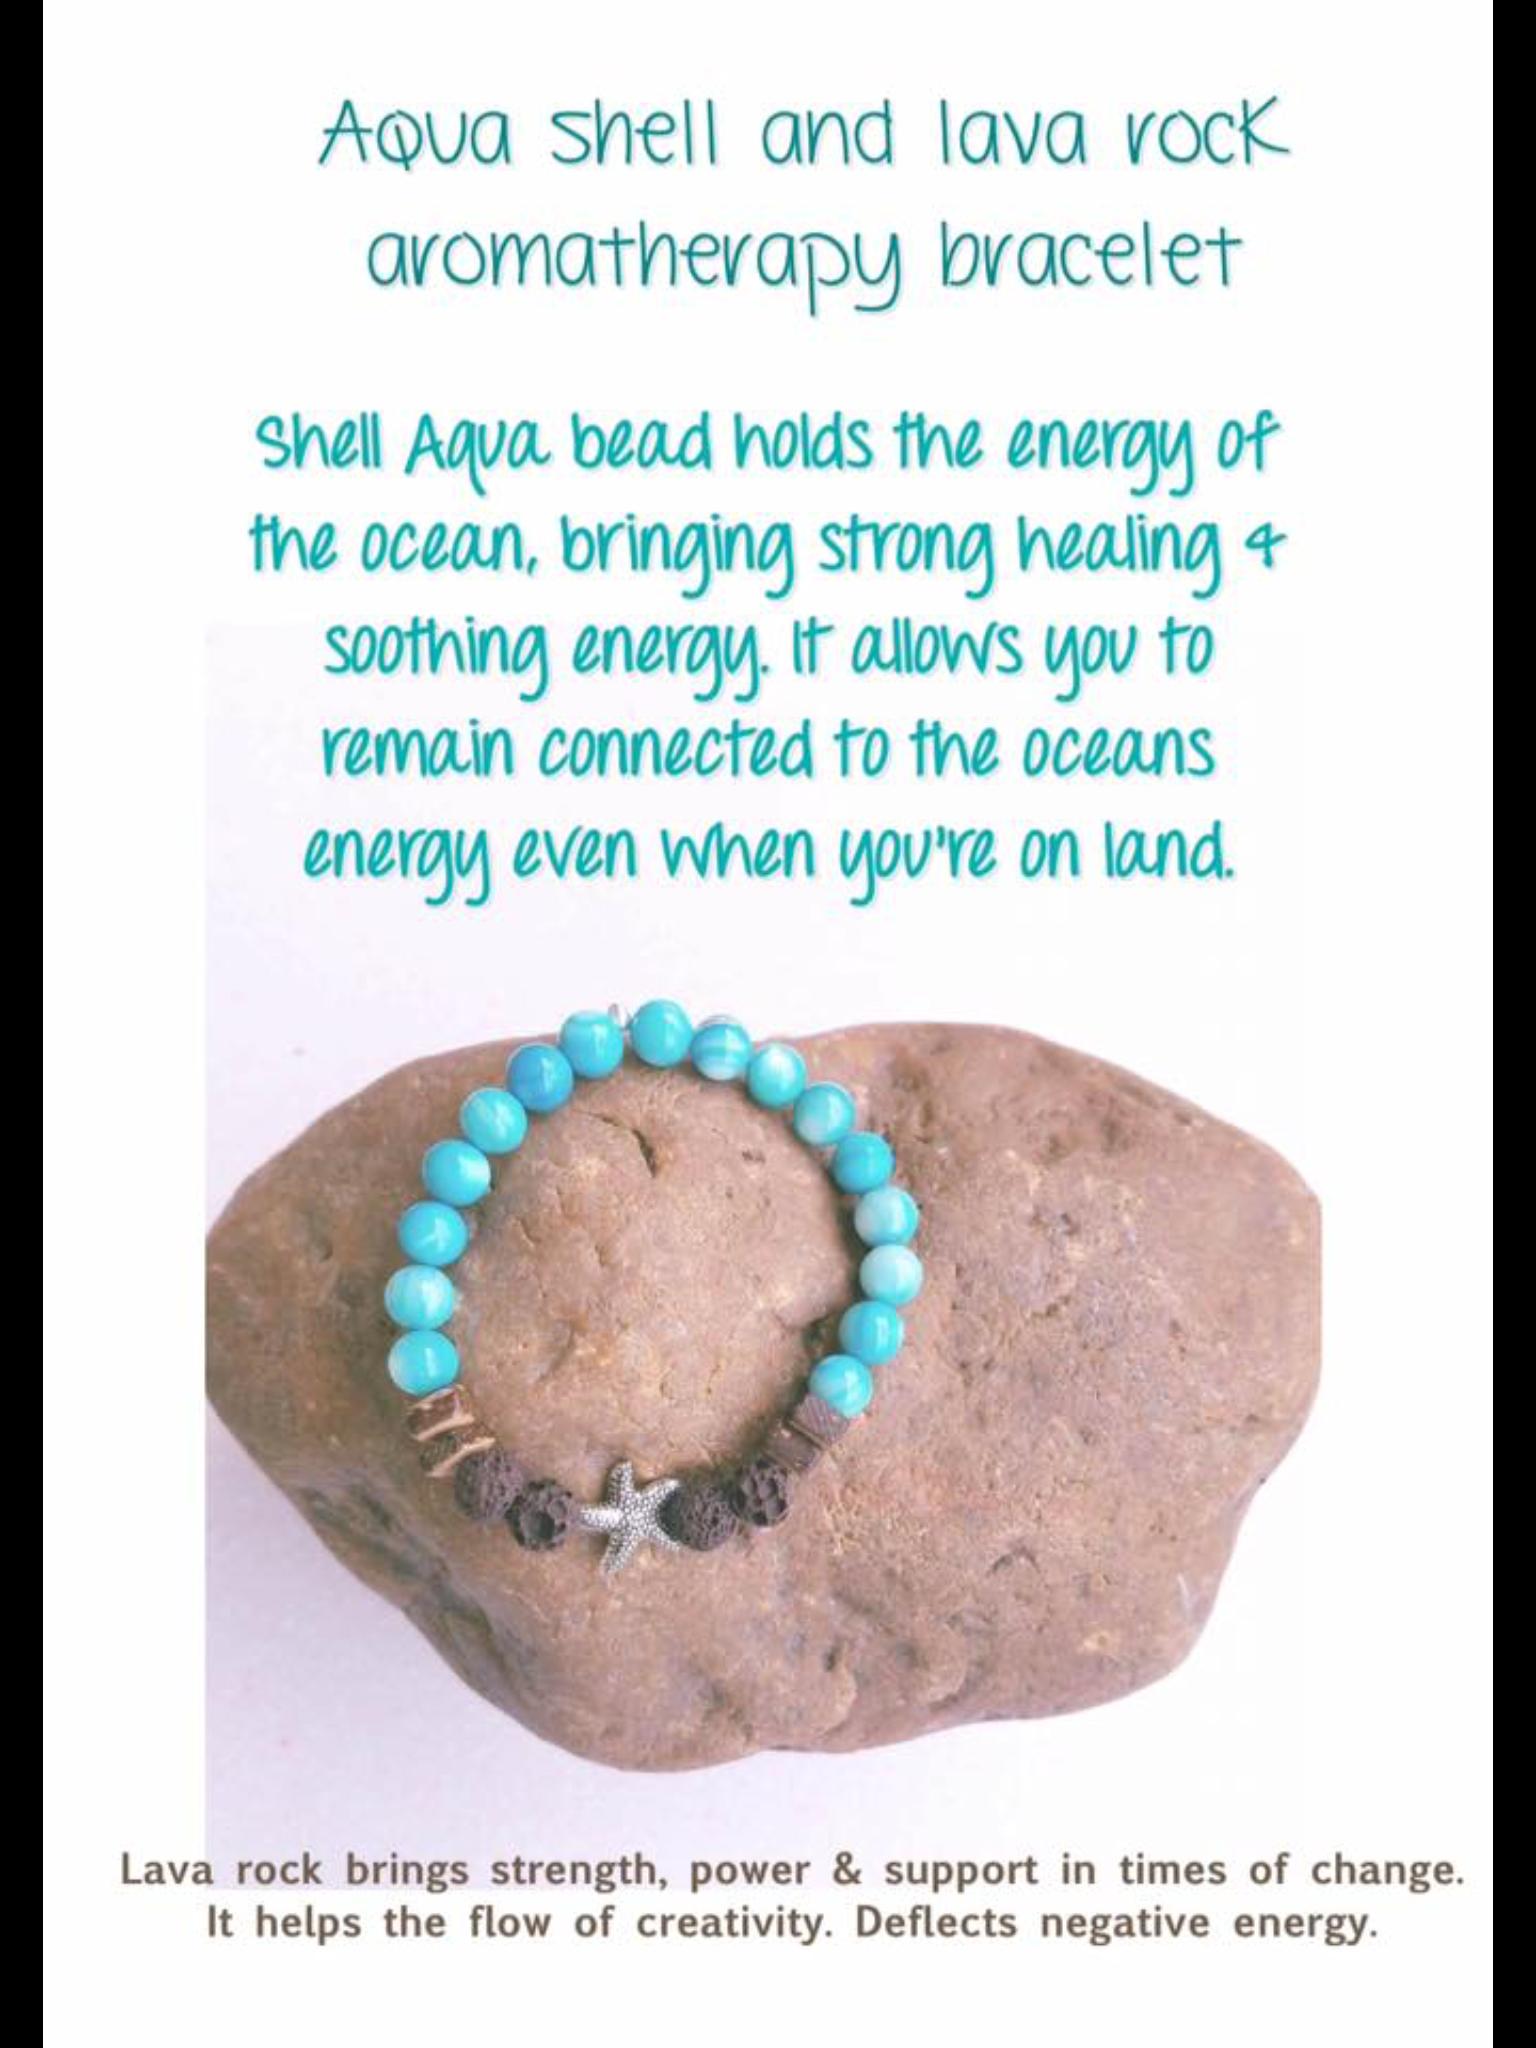 $10.00 shell Aqua & lava rock starfish aromatherapy bracelet https://www.facebook.com/3eyedgoddess/